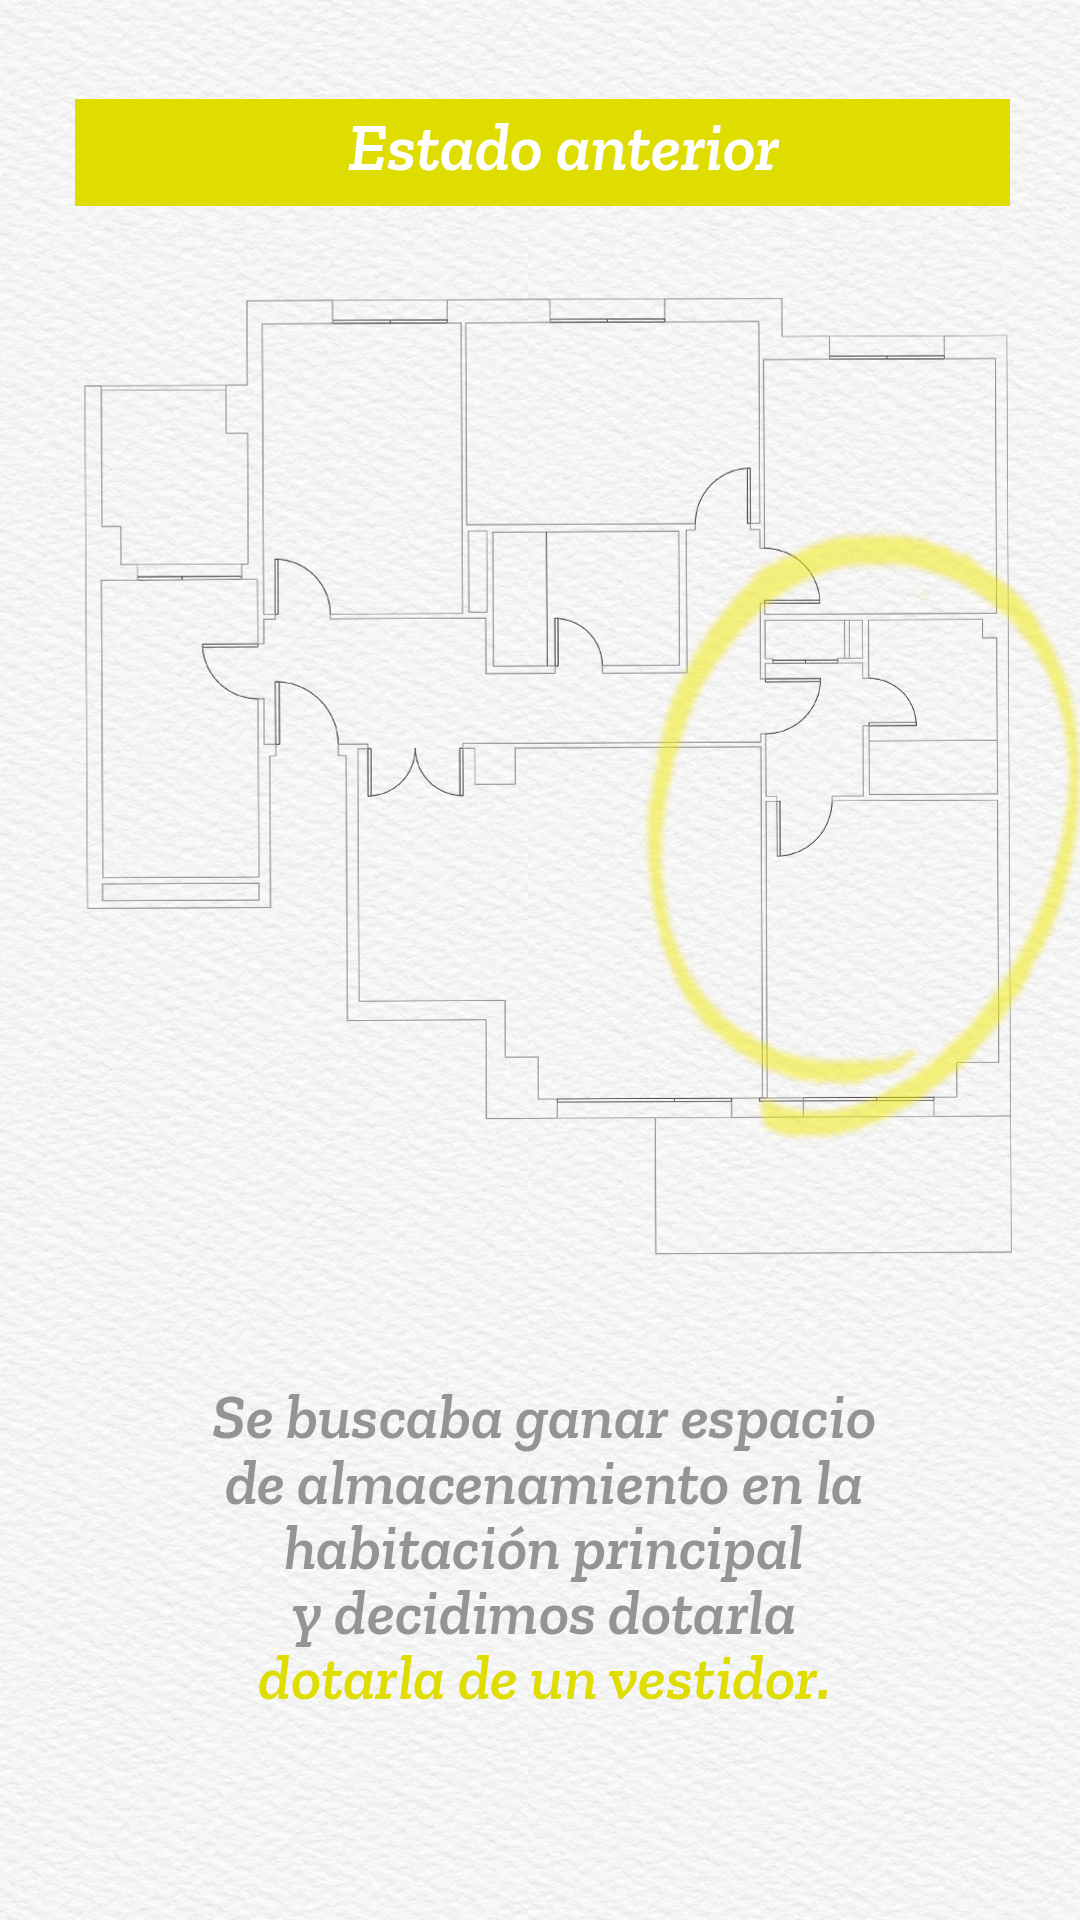 Reforma integral de piso en Zaragoza - Reformas Zaragoza | COTA ZETA